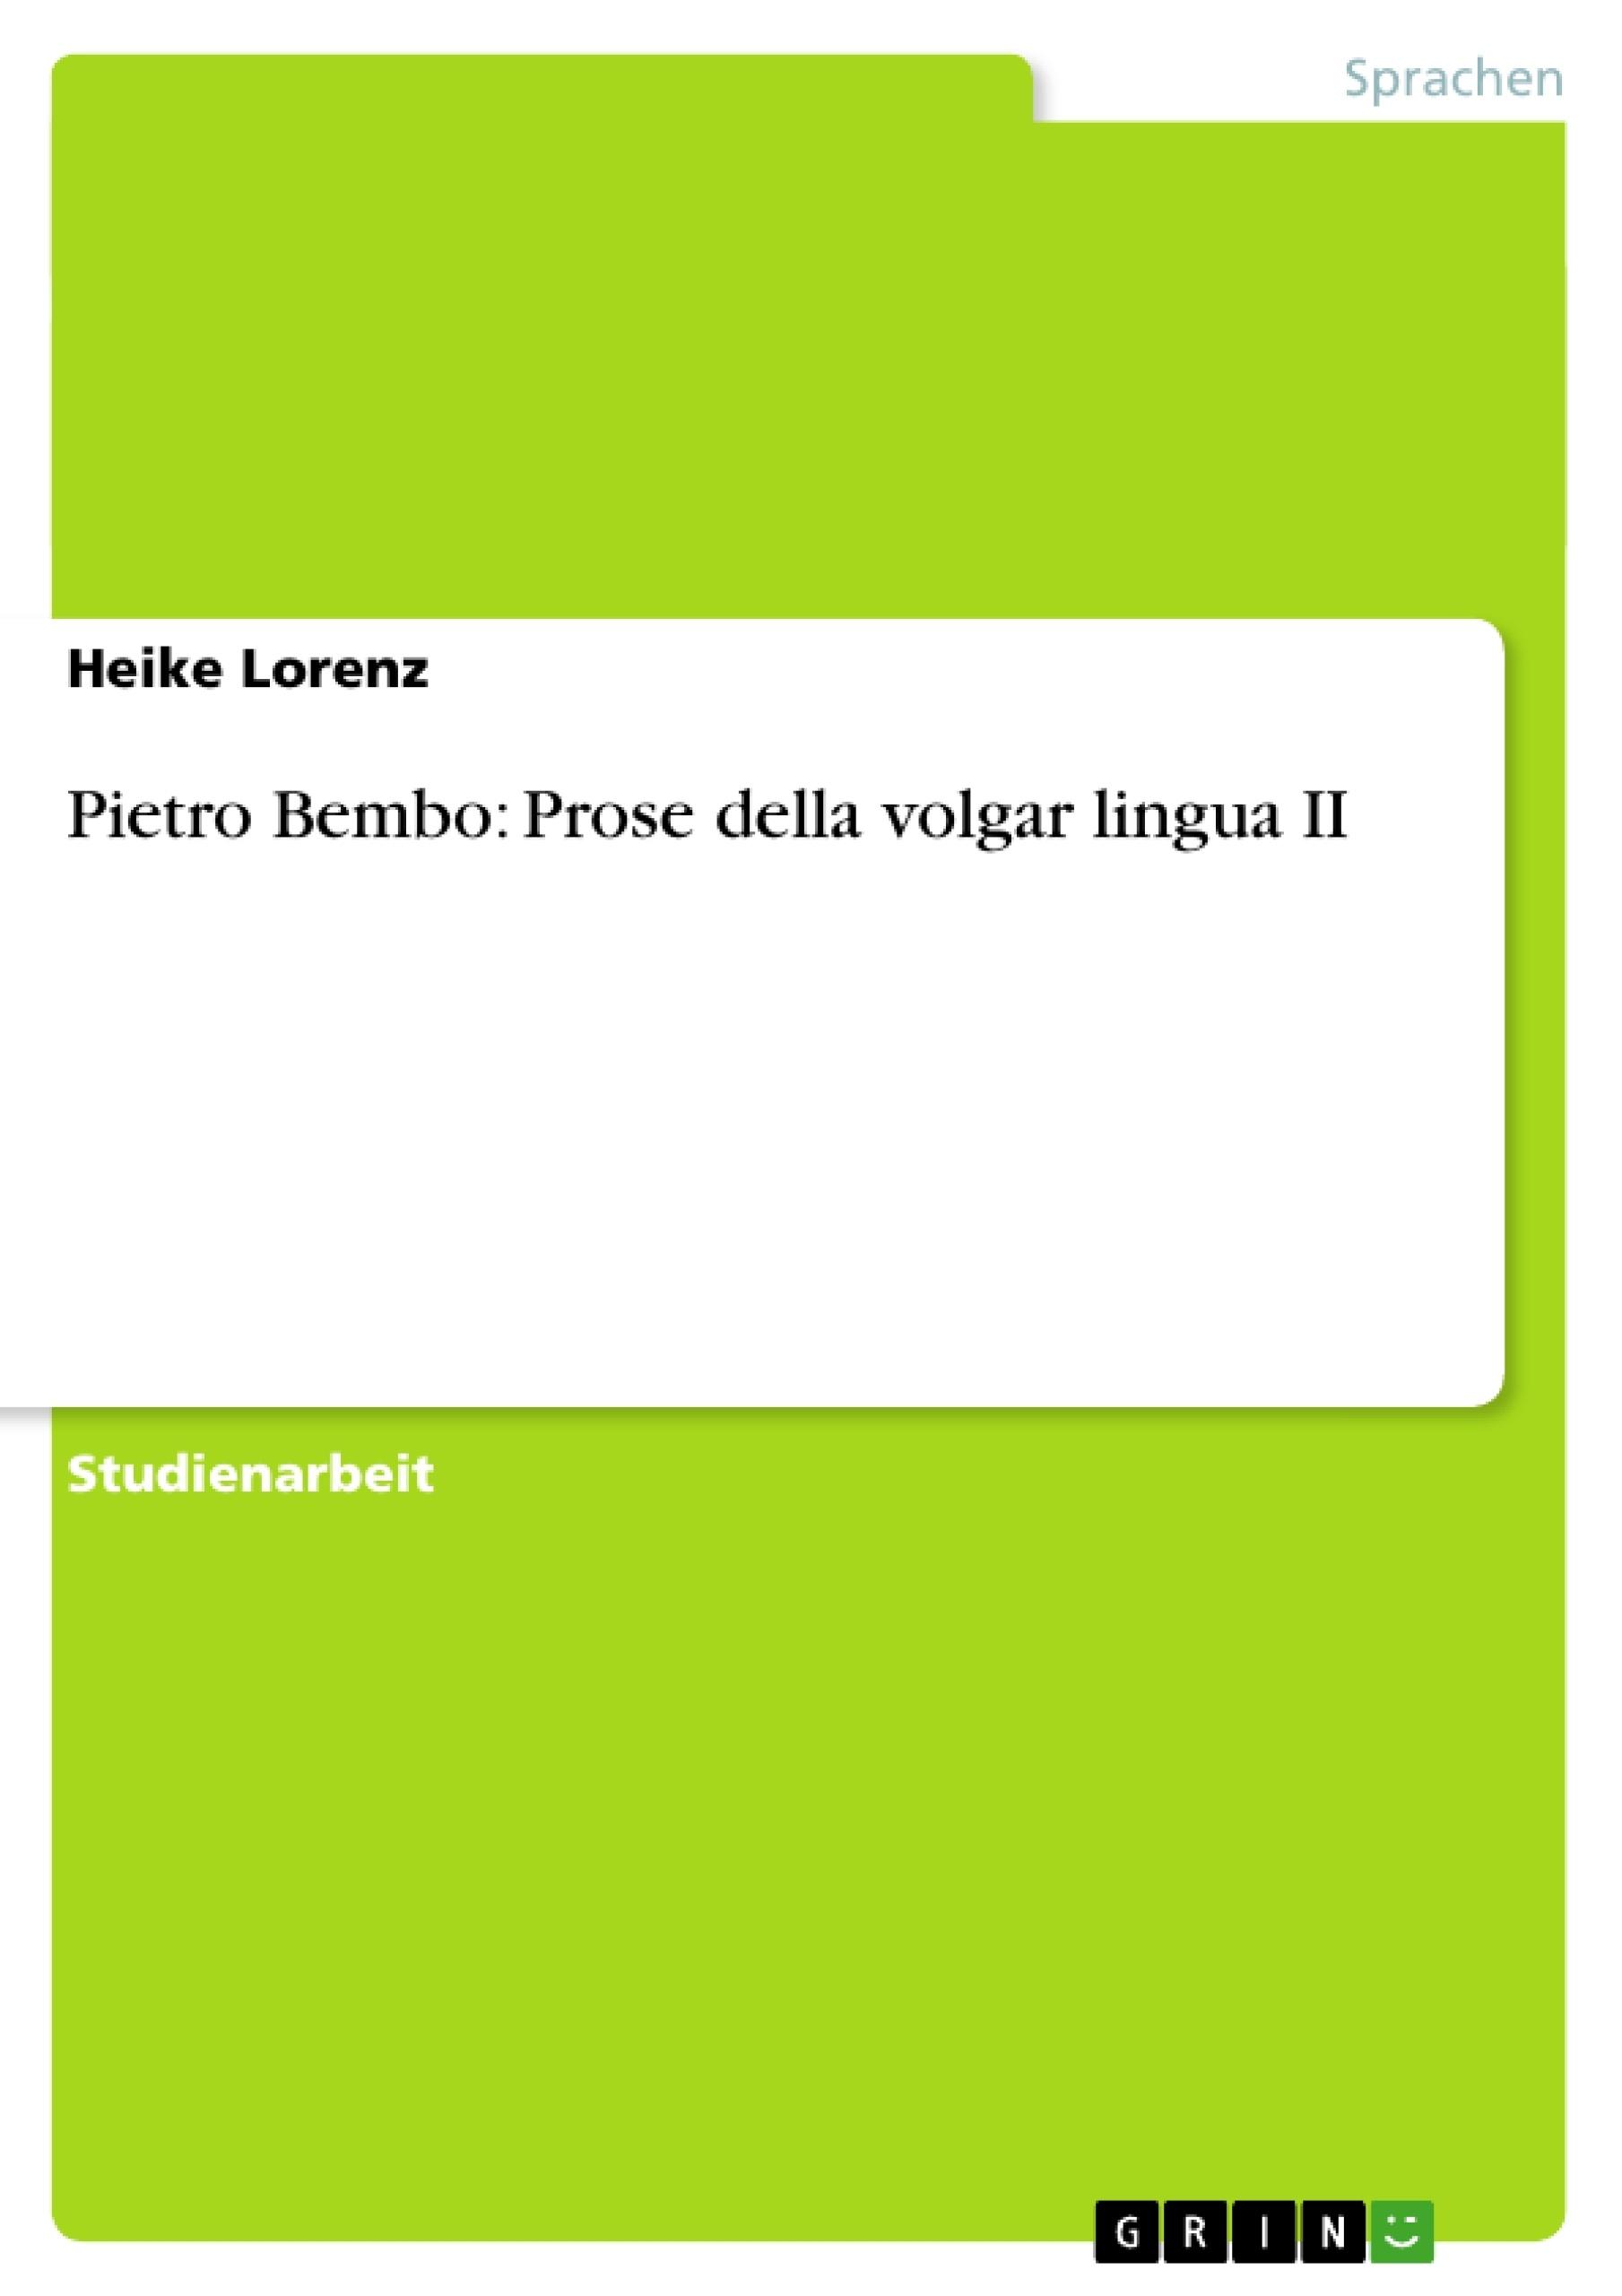 Titel: Pietro Bembo: Prose della volgar lingua II